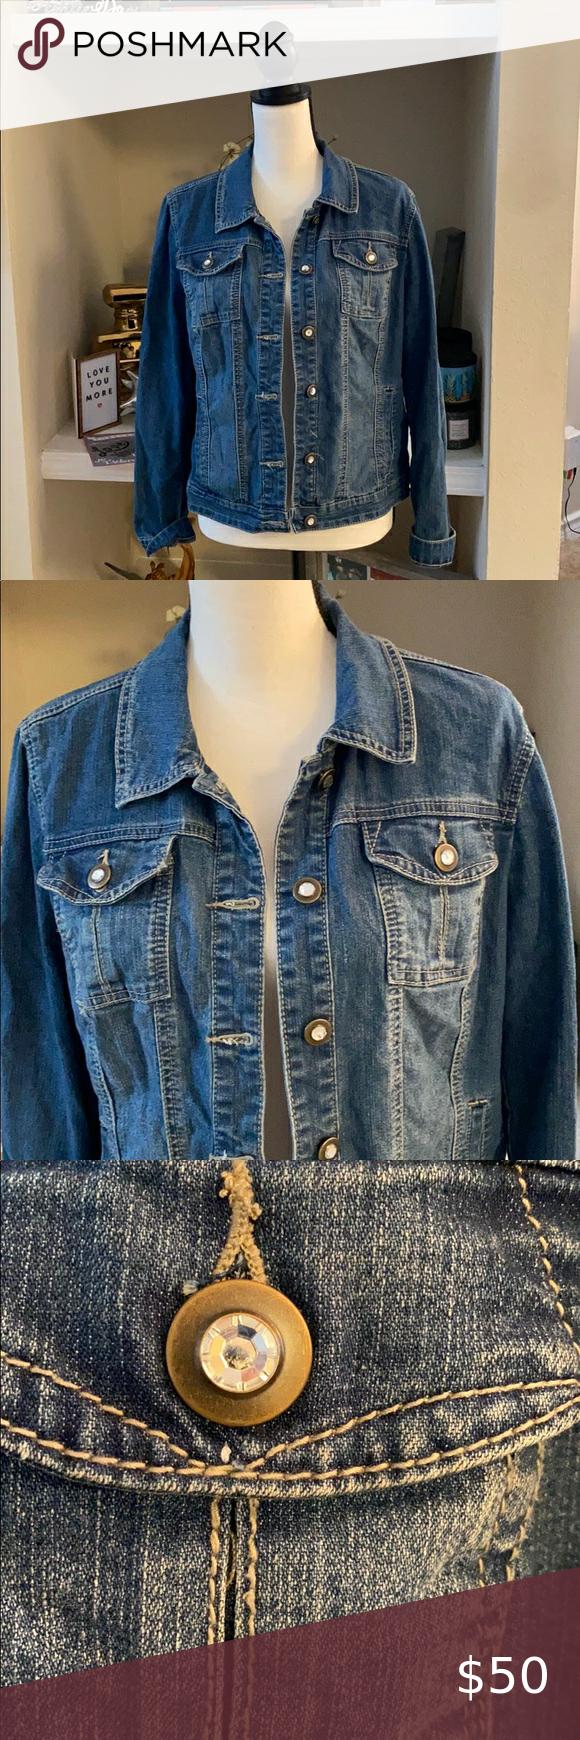 Denim Jean Jacket By Baccini Size L Denim Jean Jacket Jean Jacket Jackets [ 1740 x 580 Pixel ]